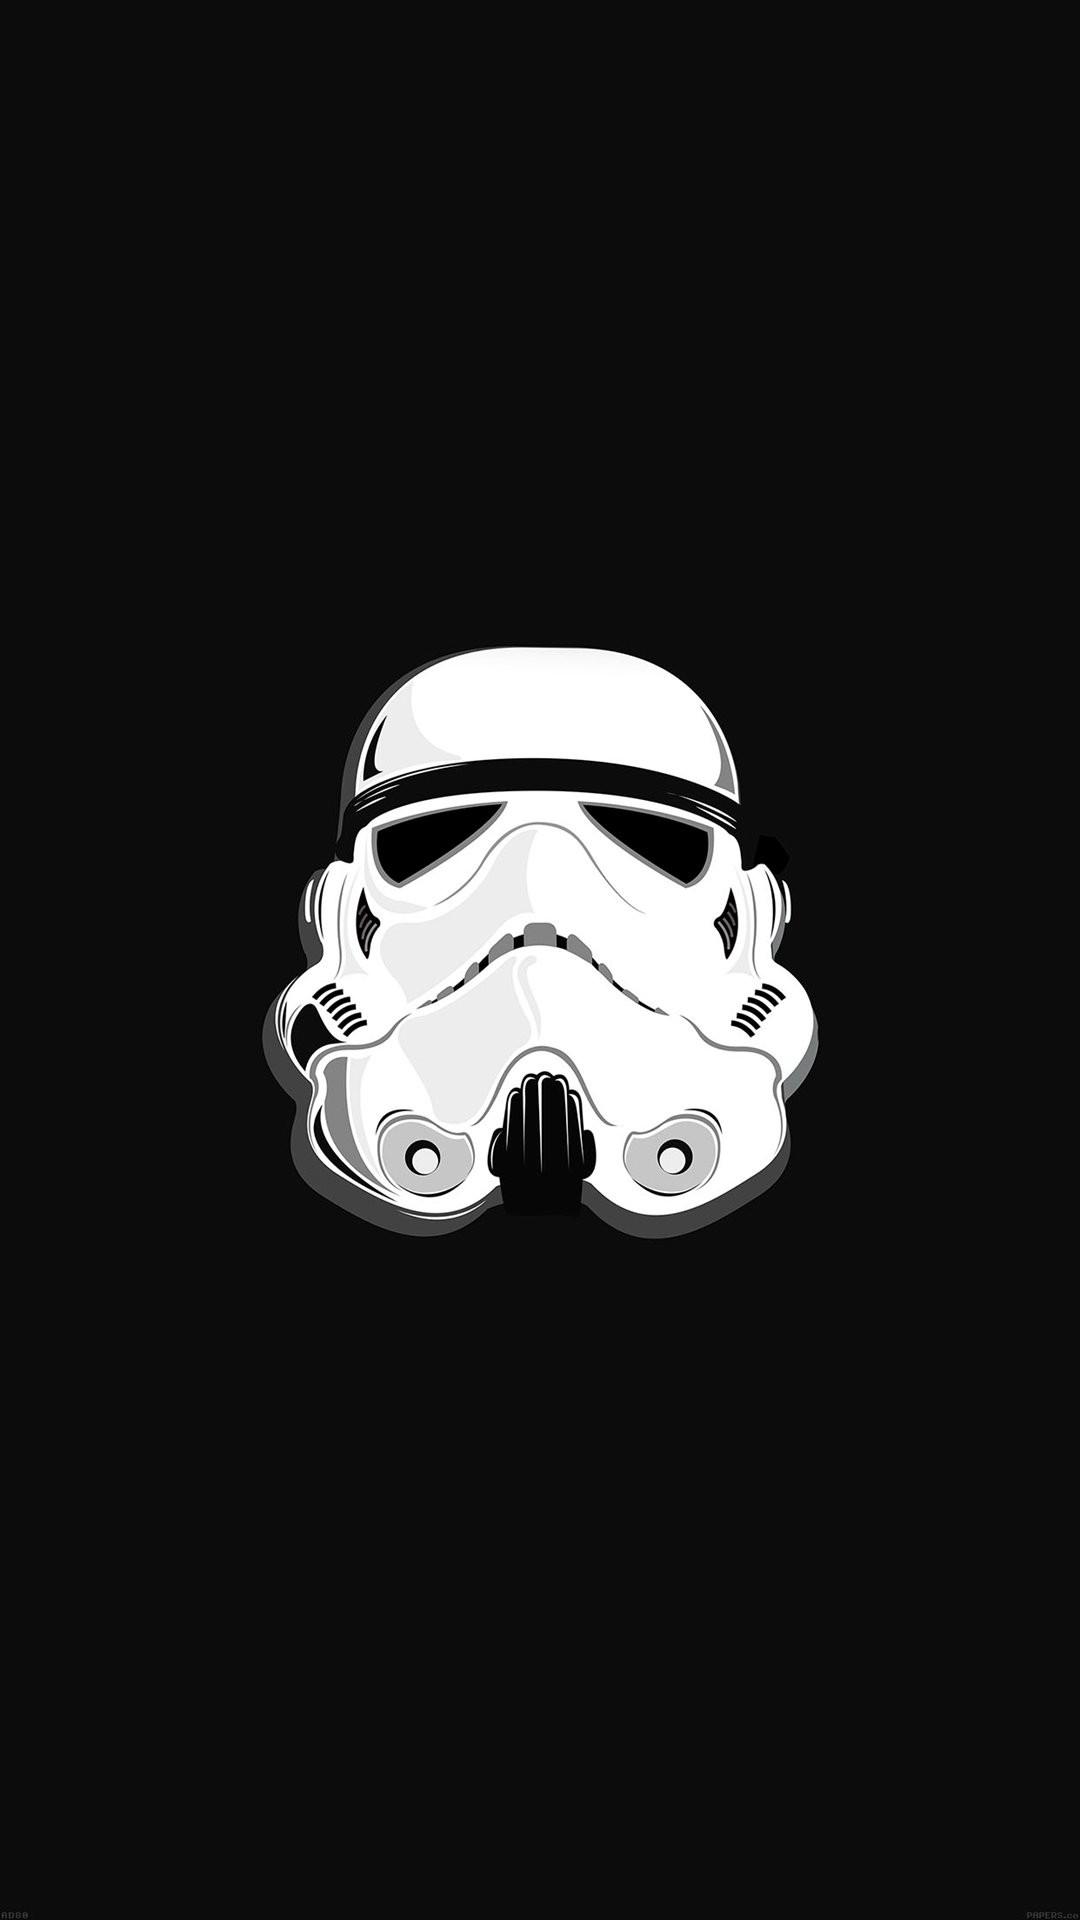 r2.ilikewallpaper.net iPhone-6-wallpapers download 28213 Star-Wars- Stormtrooper-Illustration-iPhone-6-wallpaper-ilikewallpaper_com_750.jpg    Pinterest